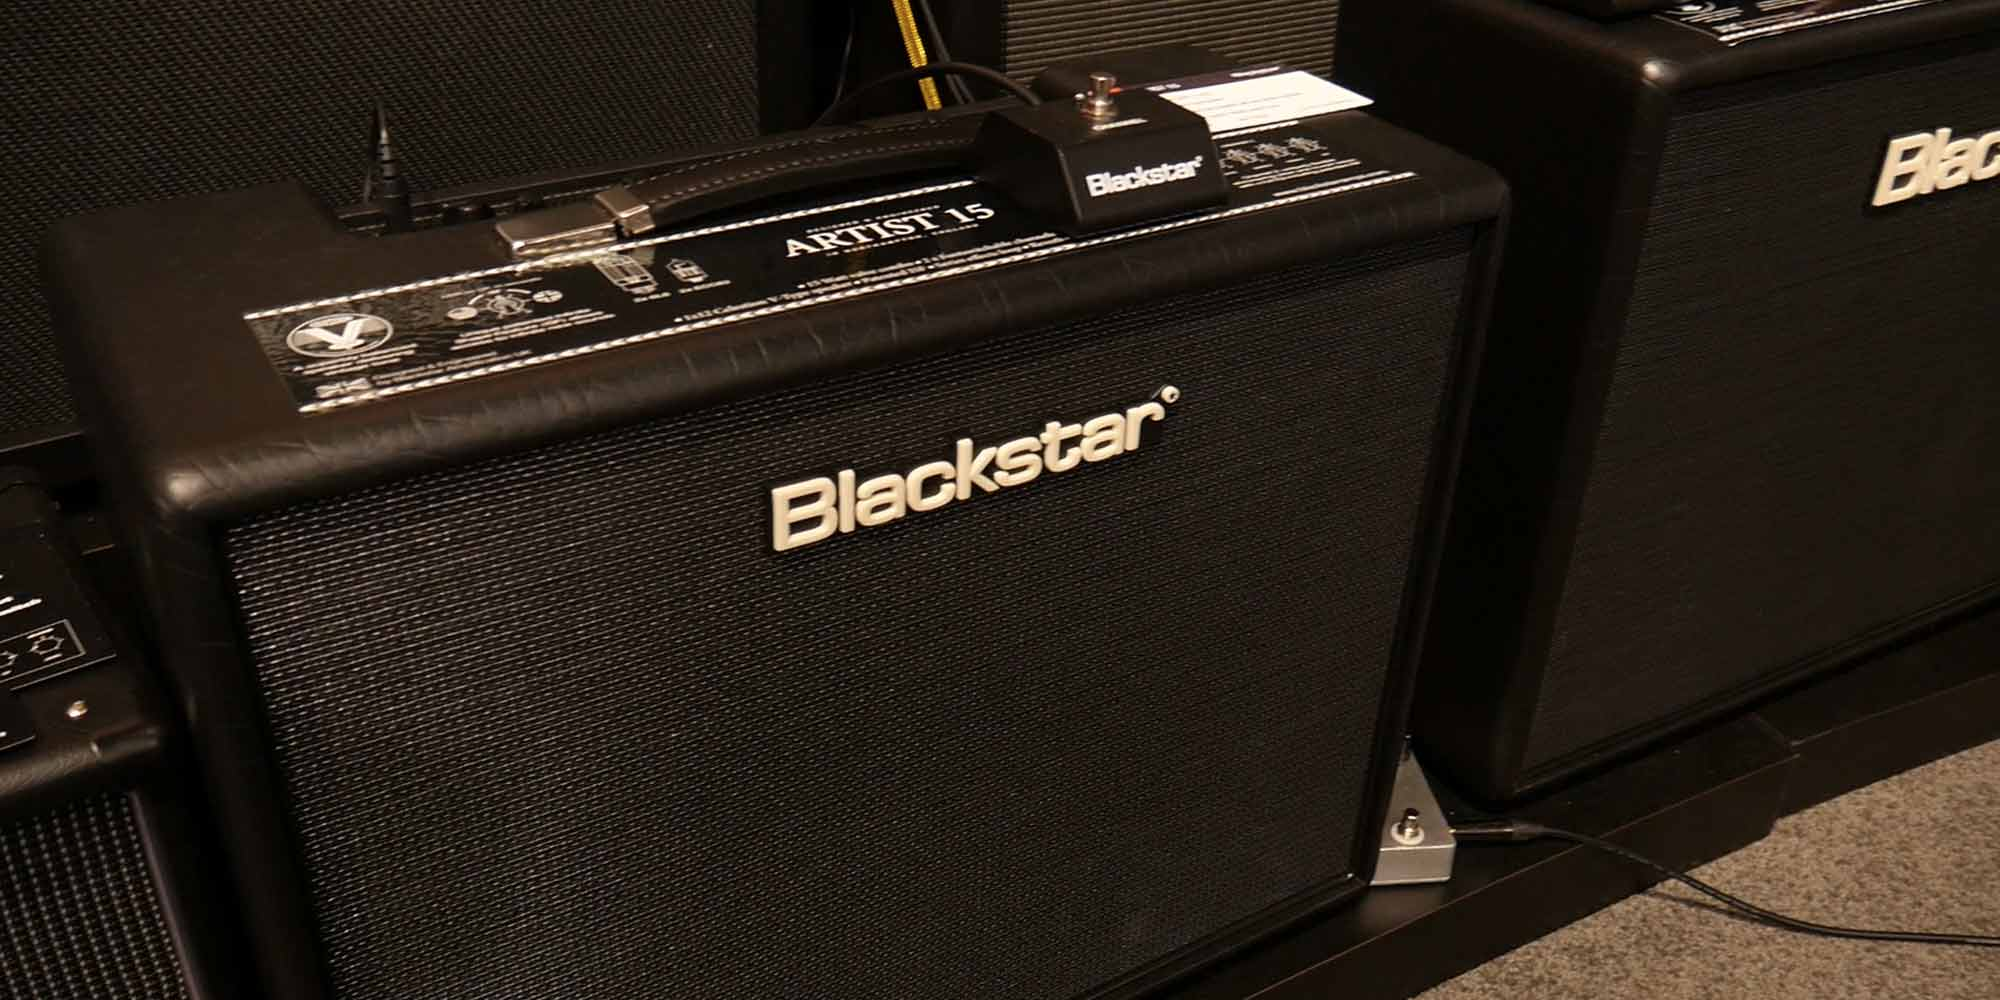 Blackstar Artist Series 15 and 30